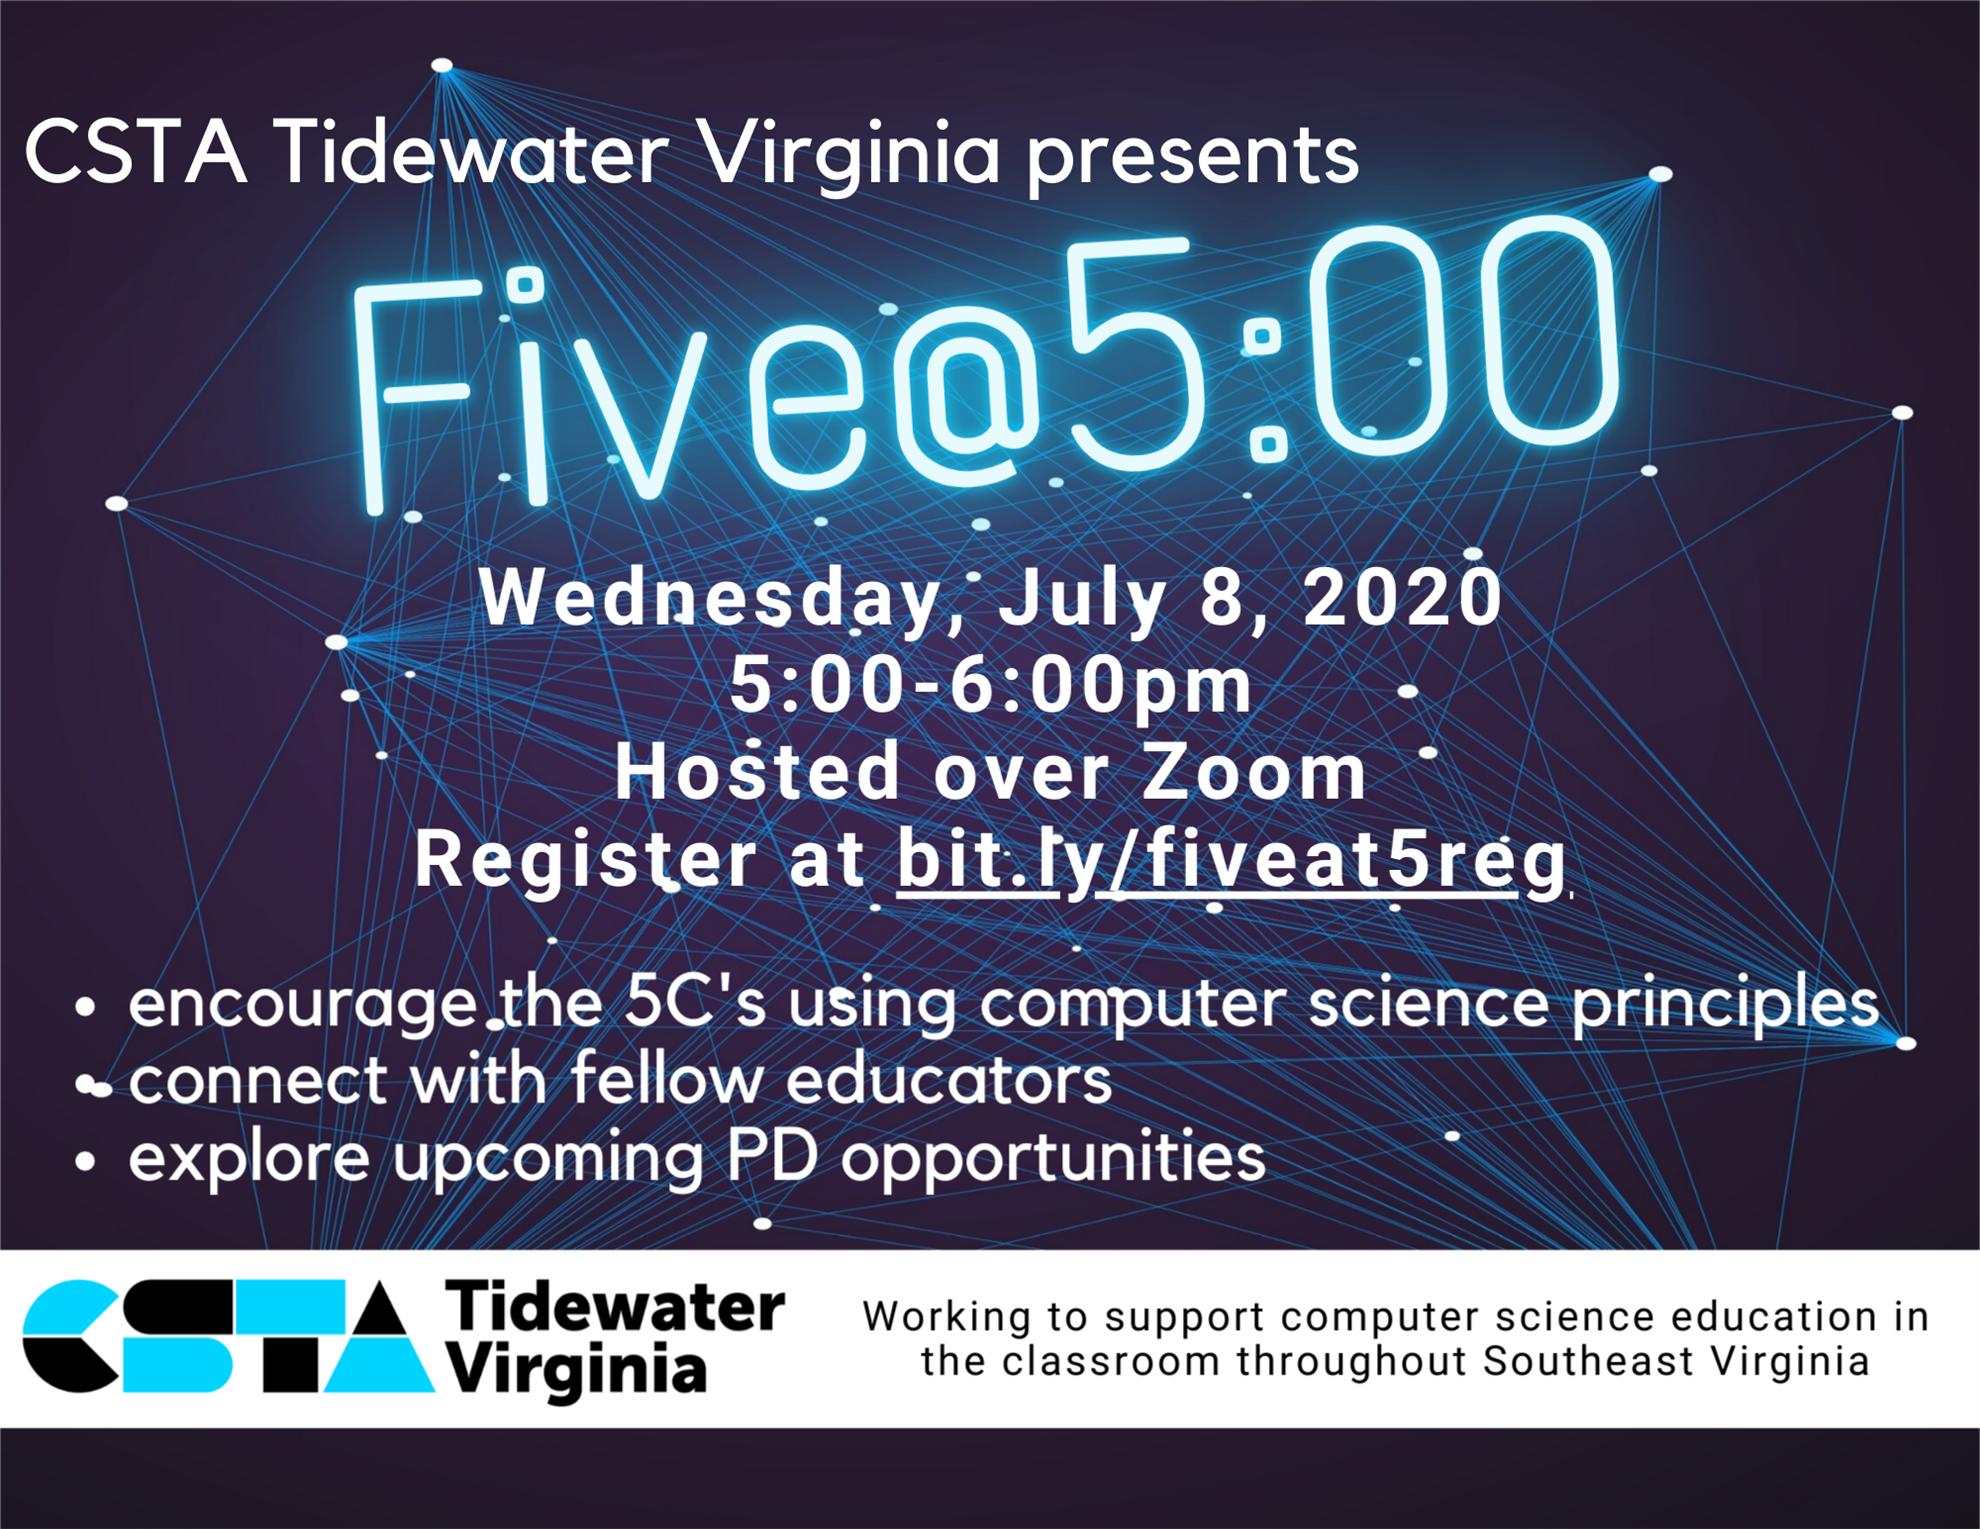 Five @ 5 (CSTA Tidewater Virginia)